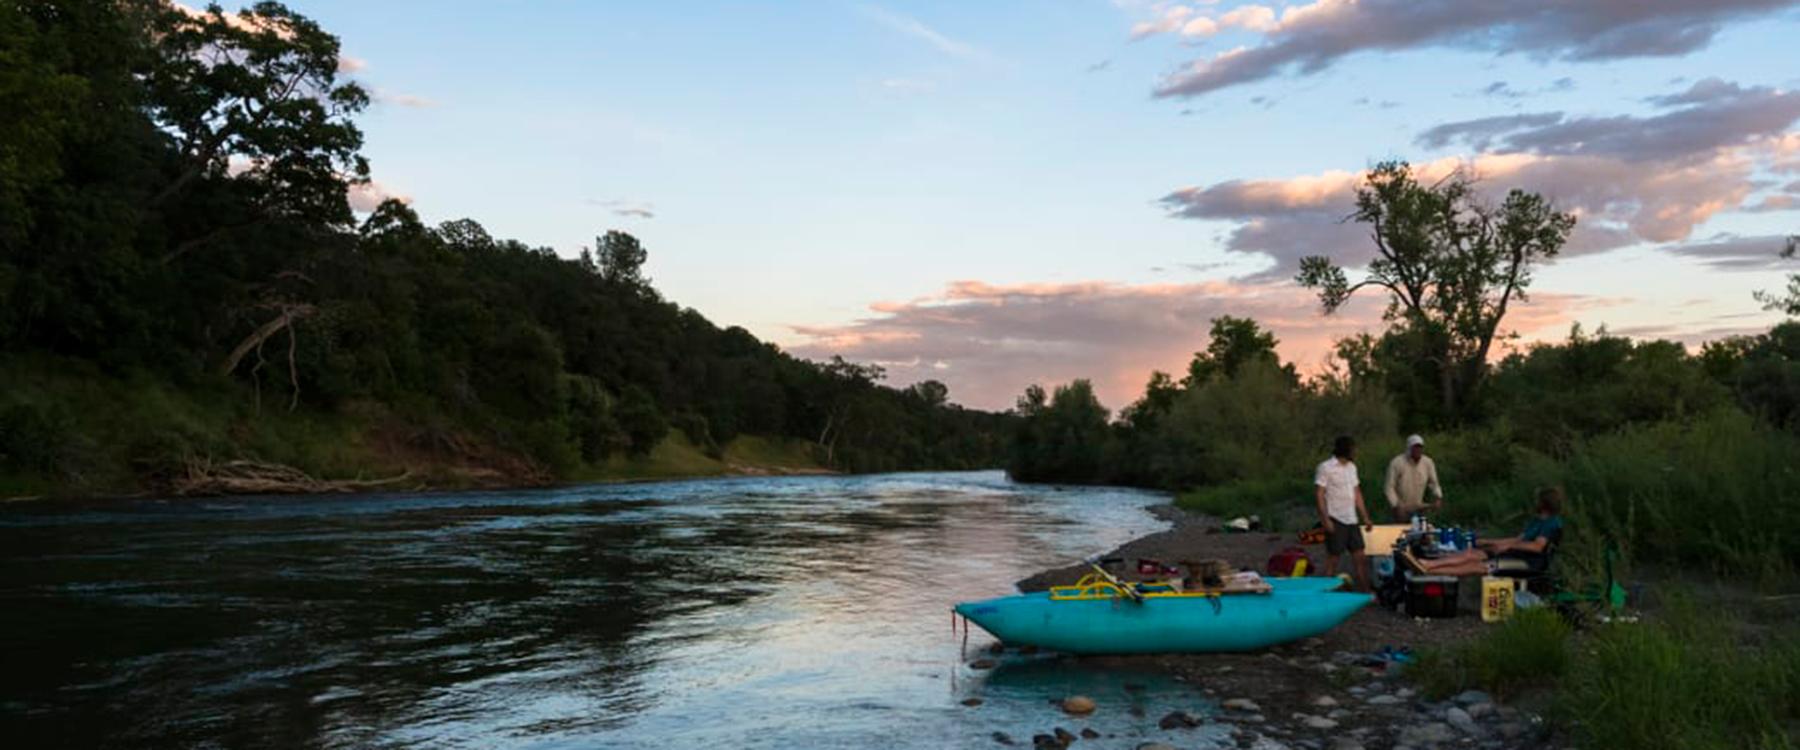 rafting the Sacramento River